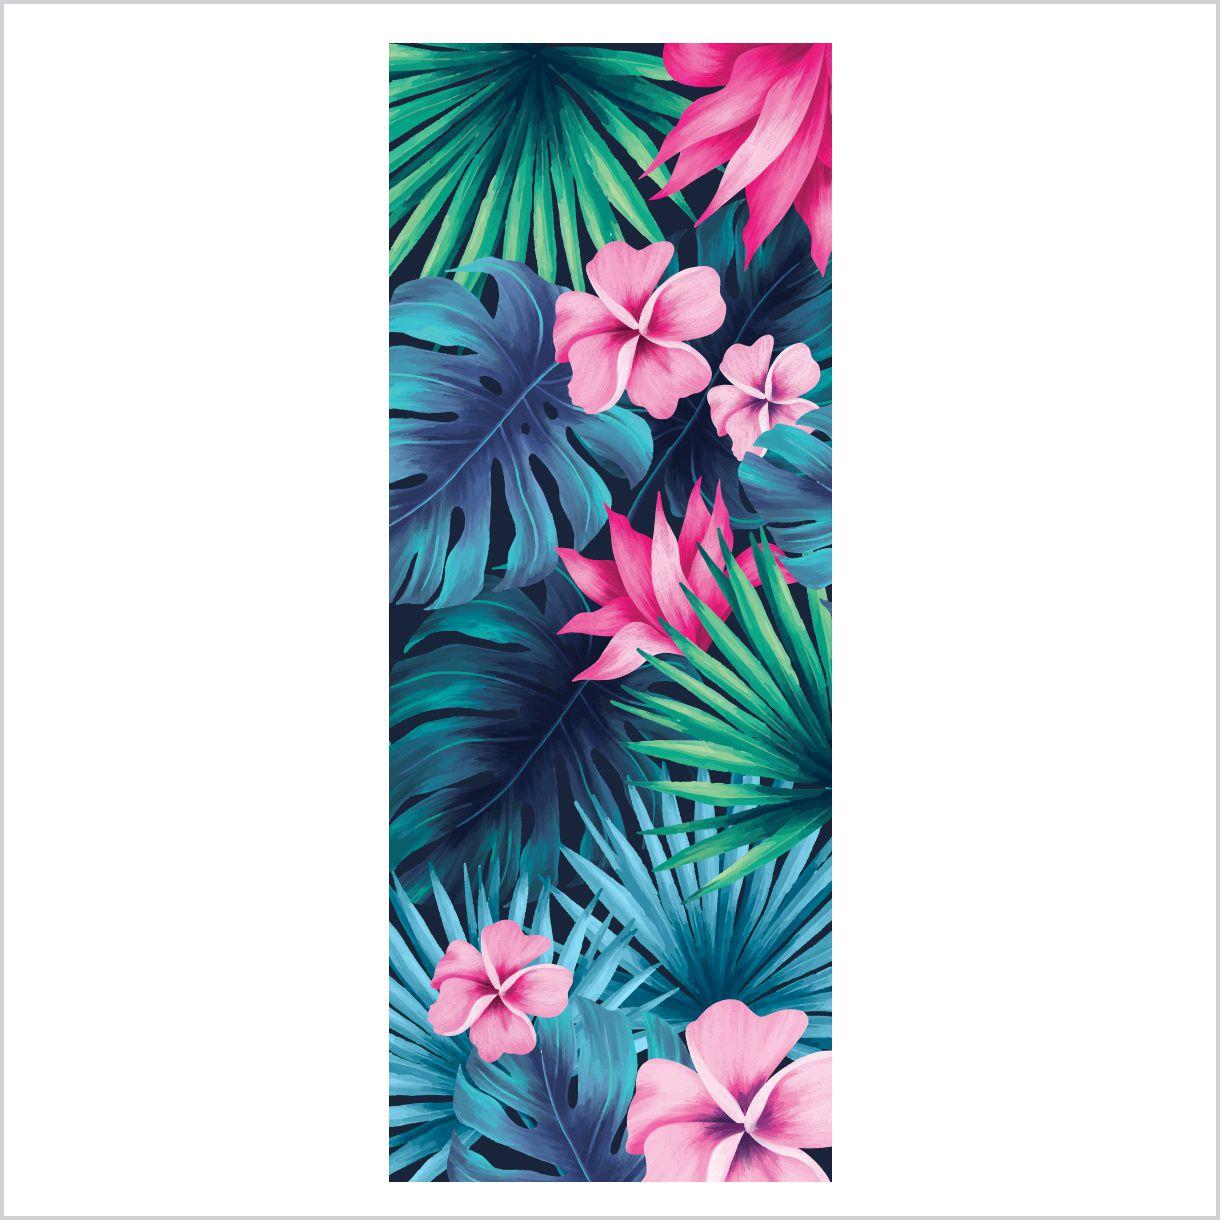 ADESIVO DE PORTA - Floral Tropical